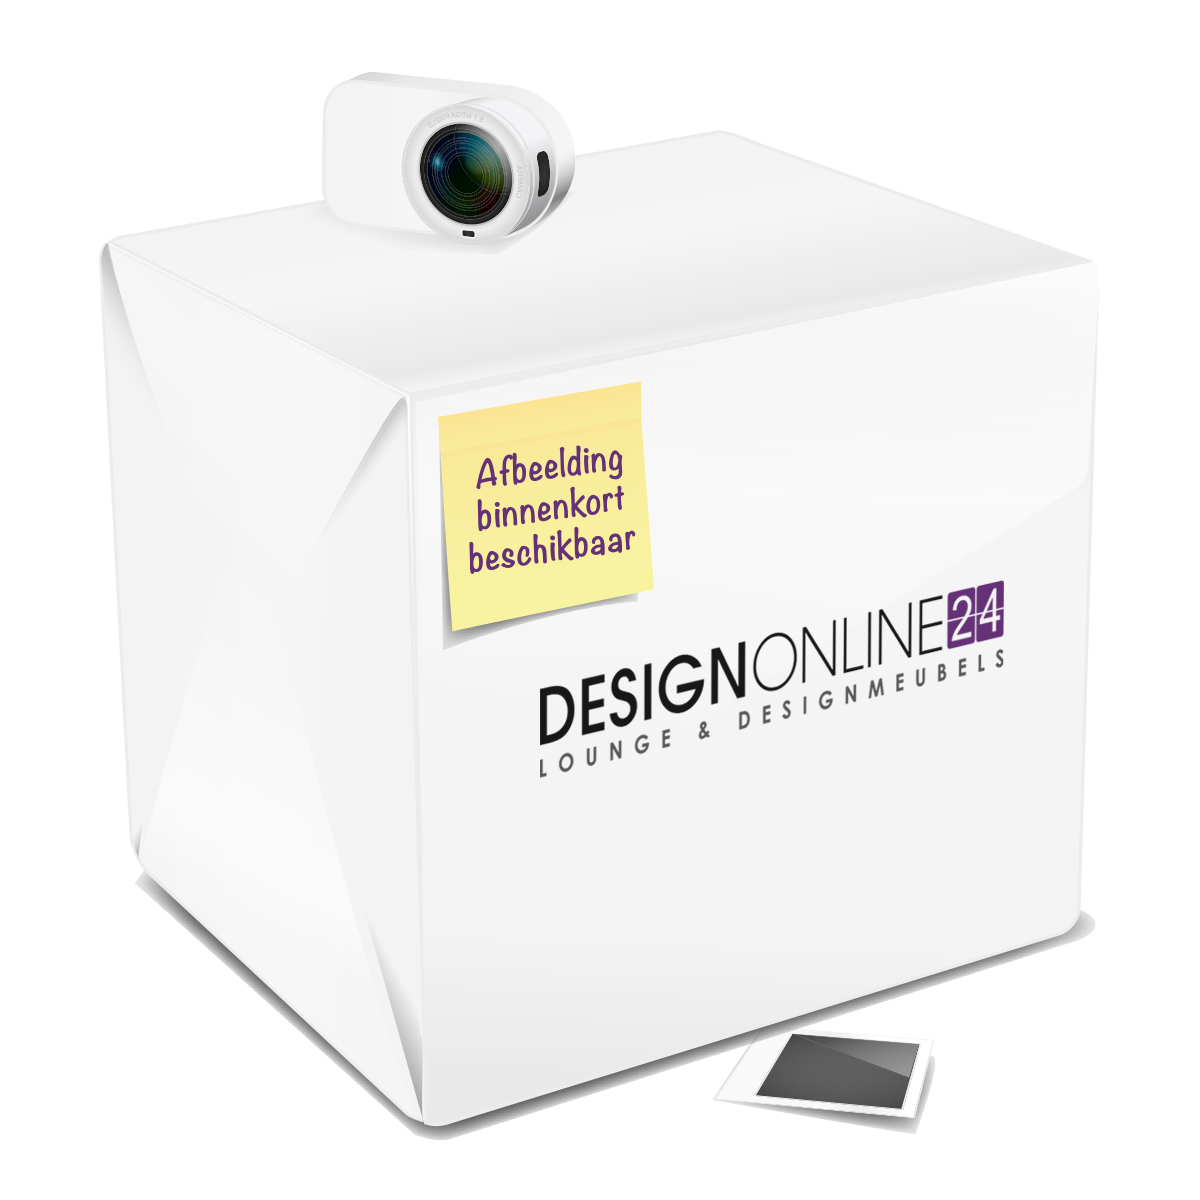 d-Bodhi Fendy Boekenrek 5-Vakken - L81 x B35 x H171 - Teakhout + Gratis Design Tafellamp twv € 79,95